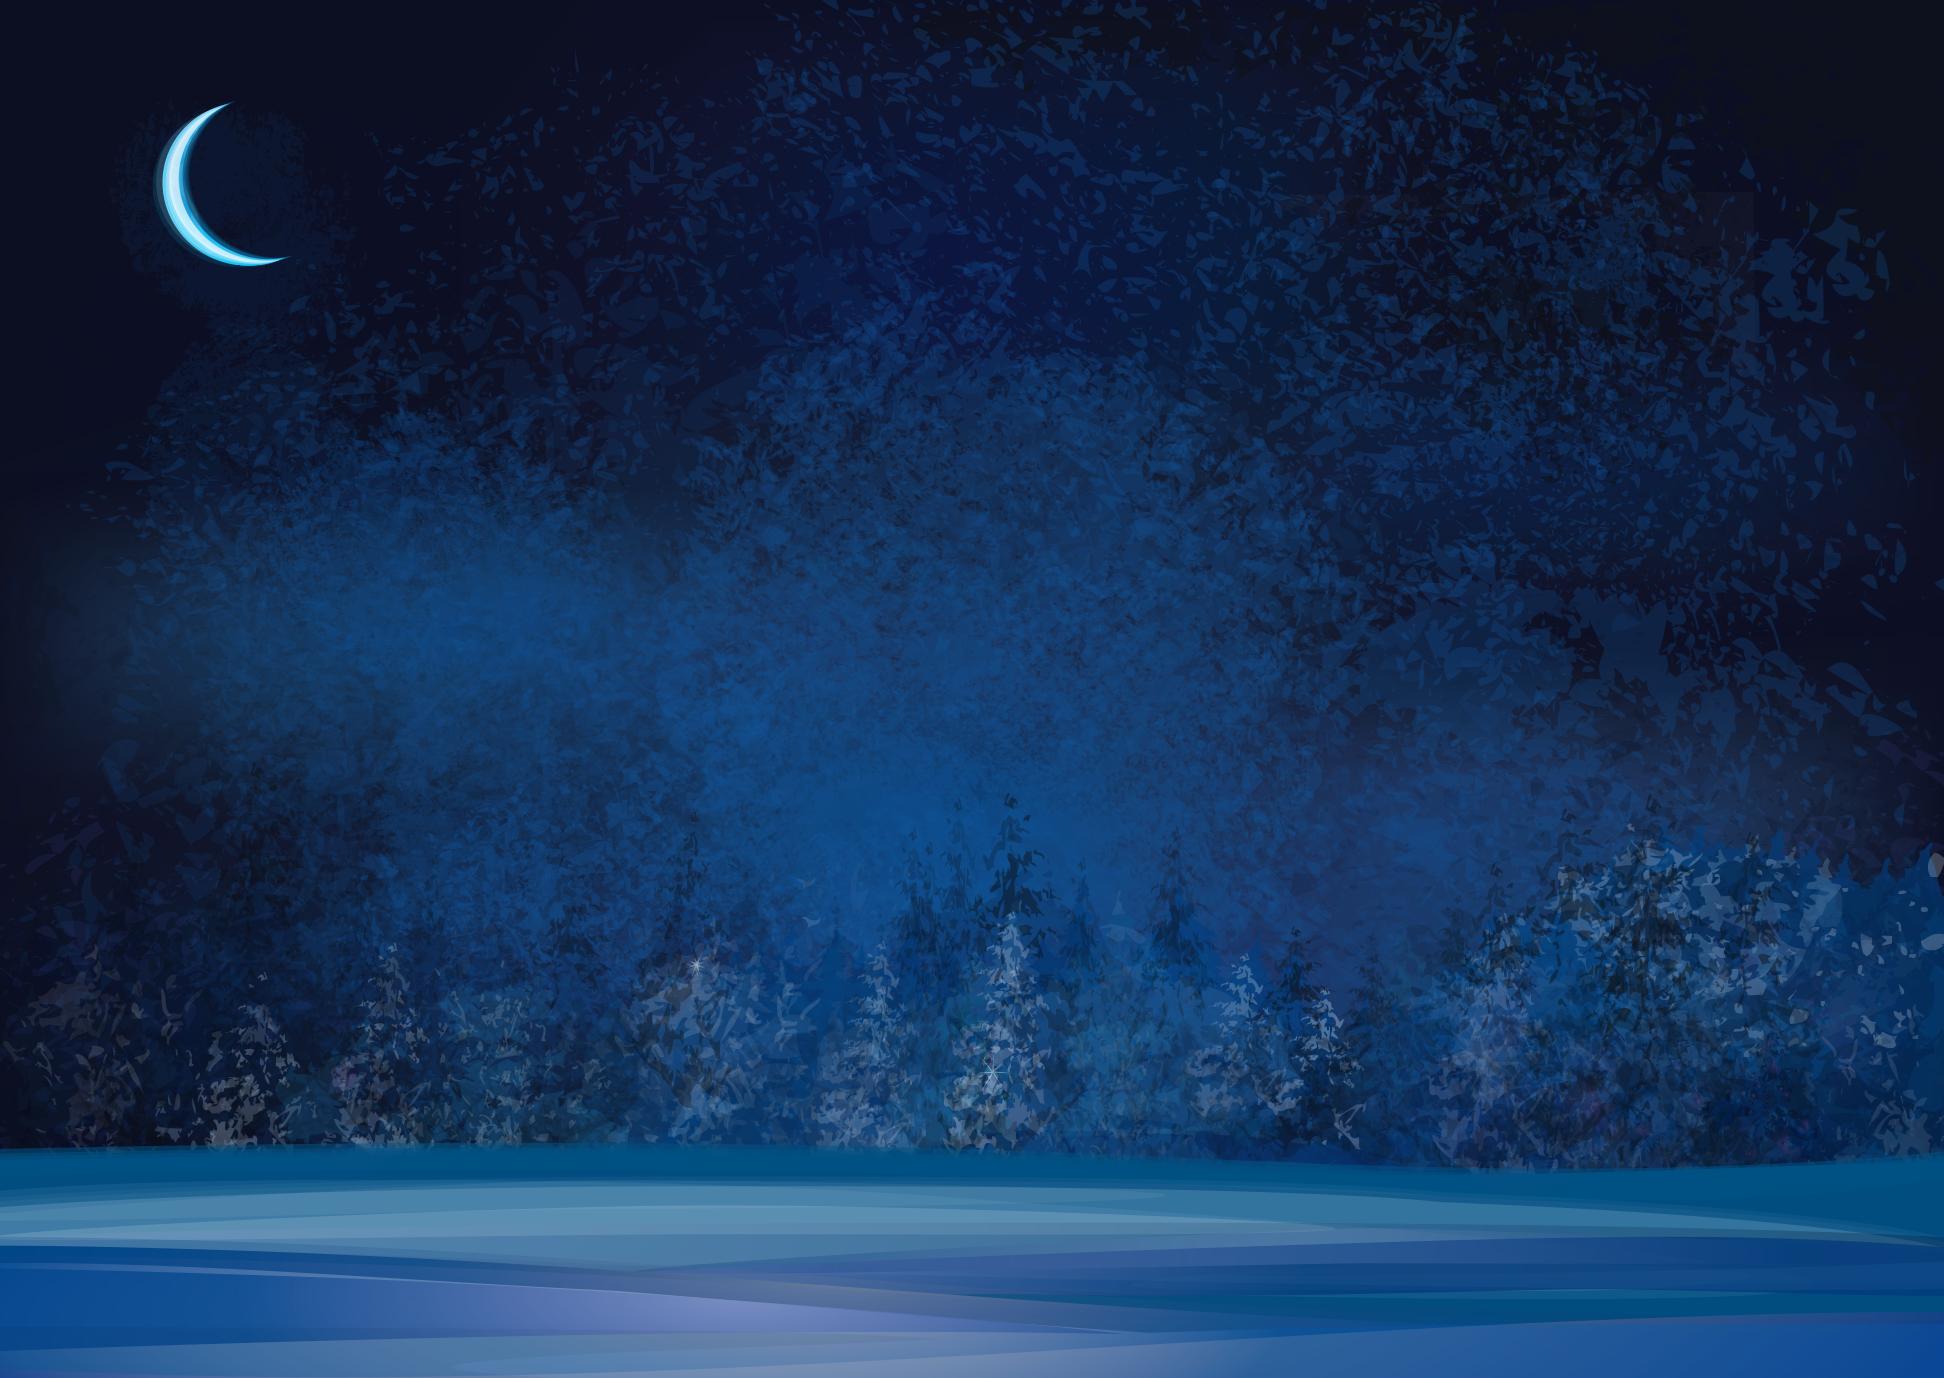 winter-bg-no-stars.png